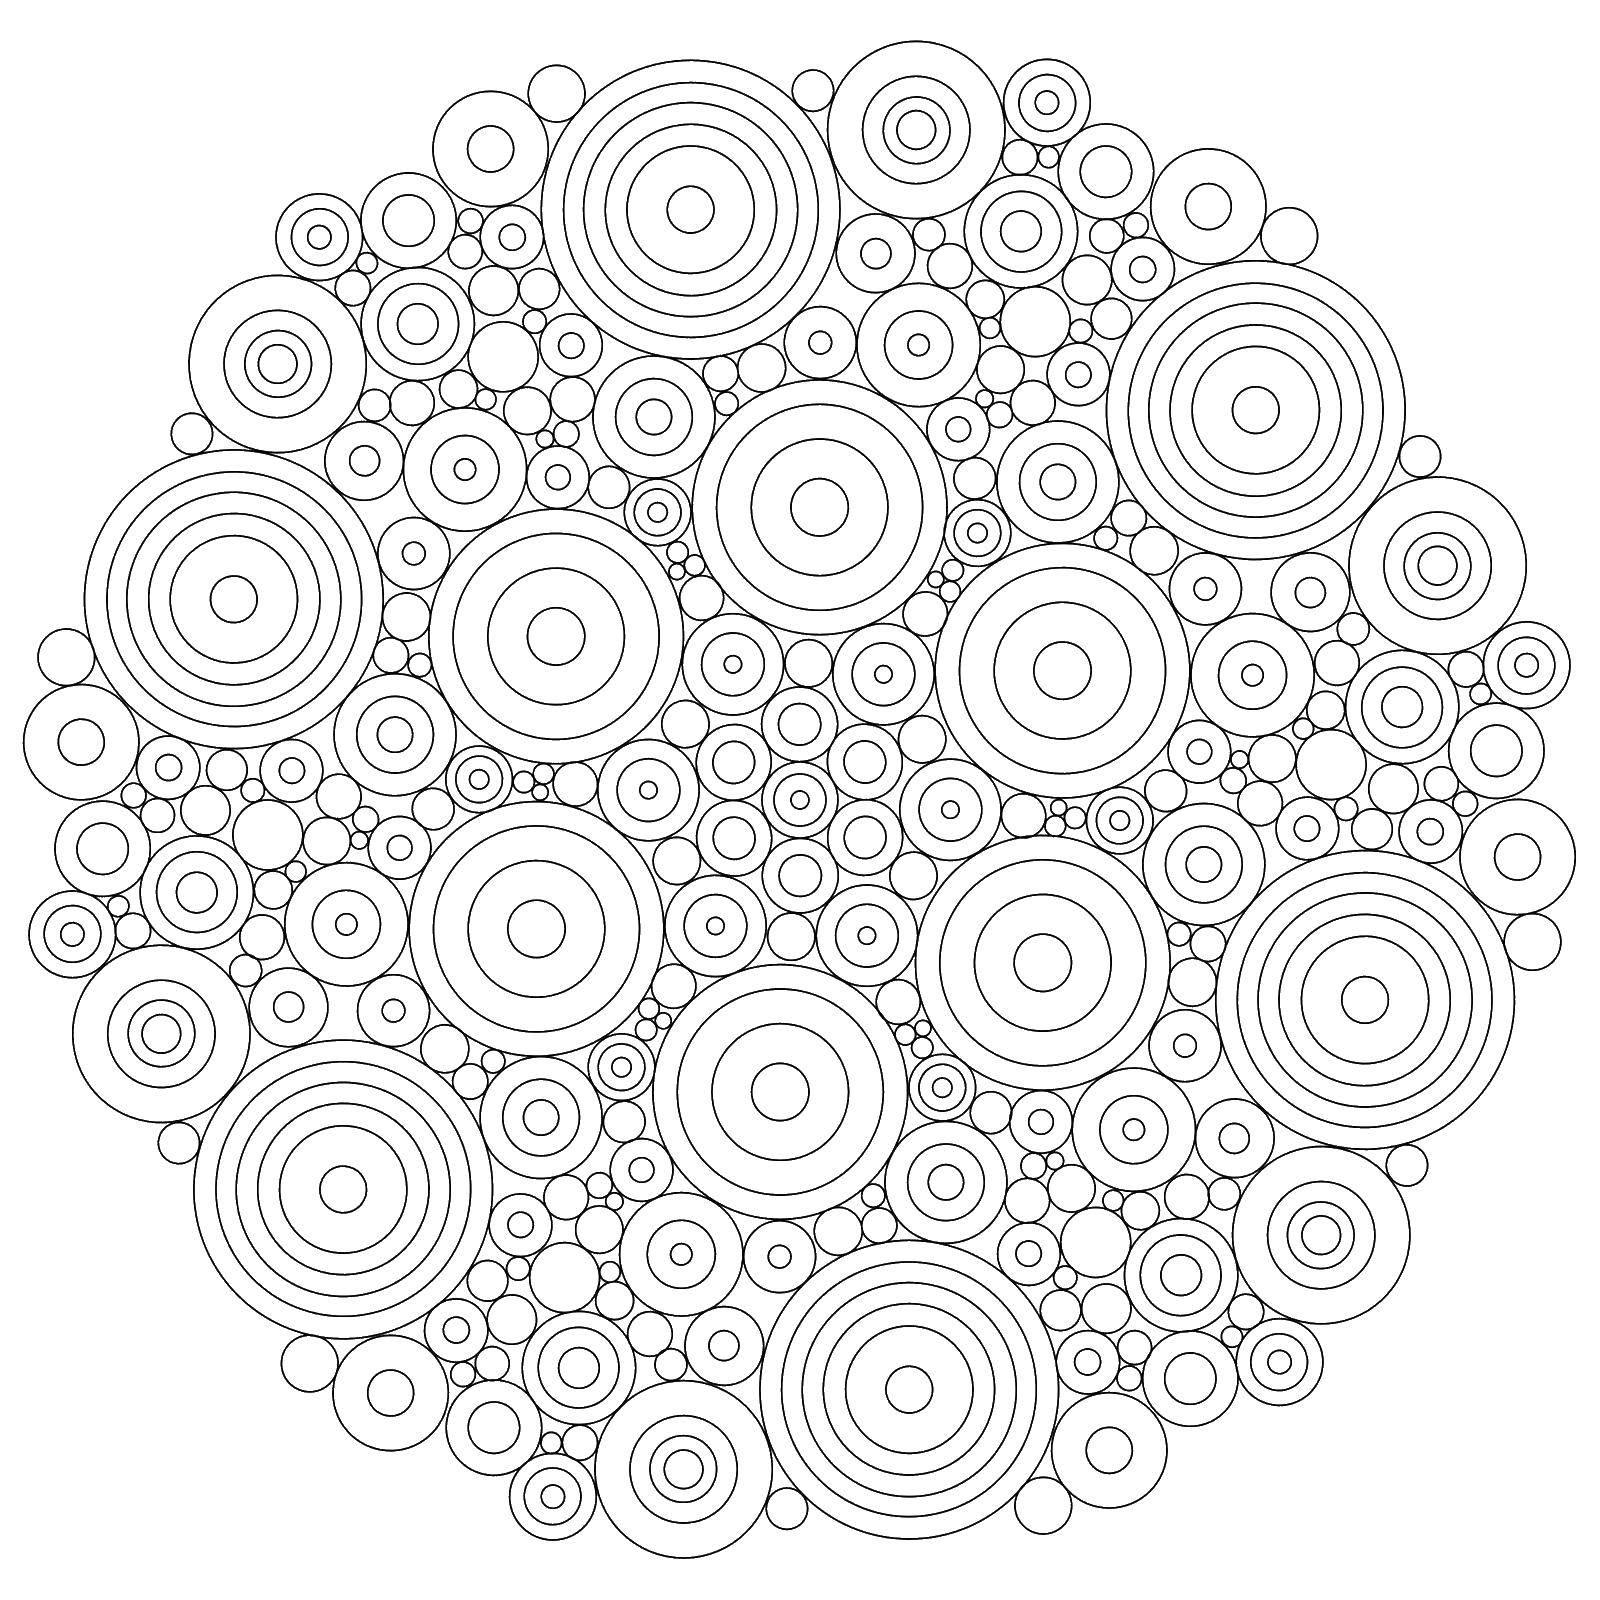 Coloring sheet patterns Download The cartoon character, the Kid and Carlson .  Print ,coloring Carlson,